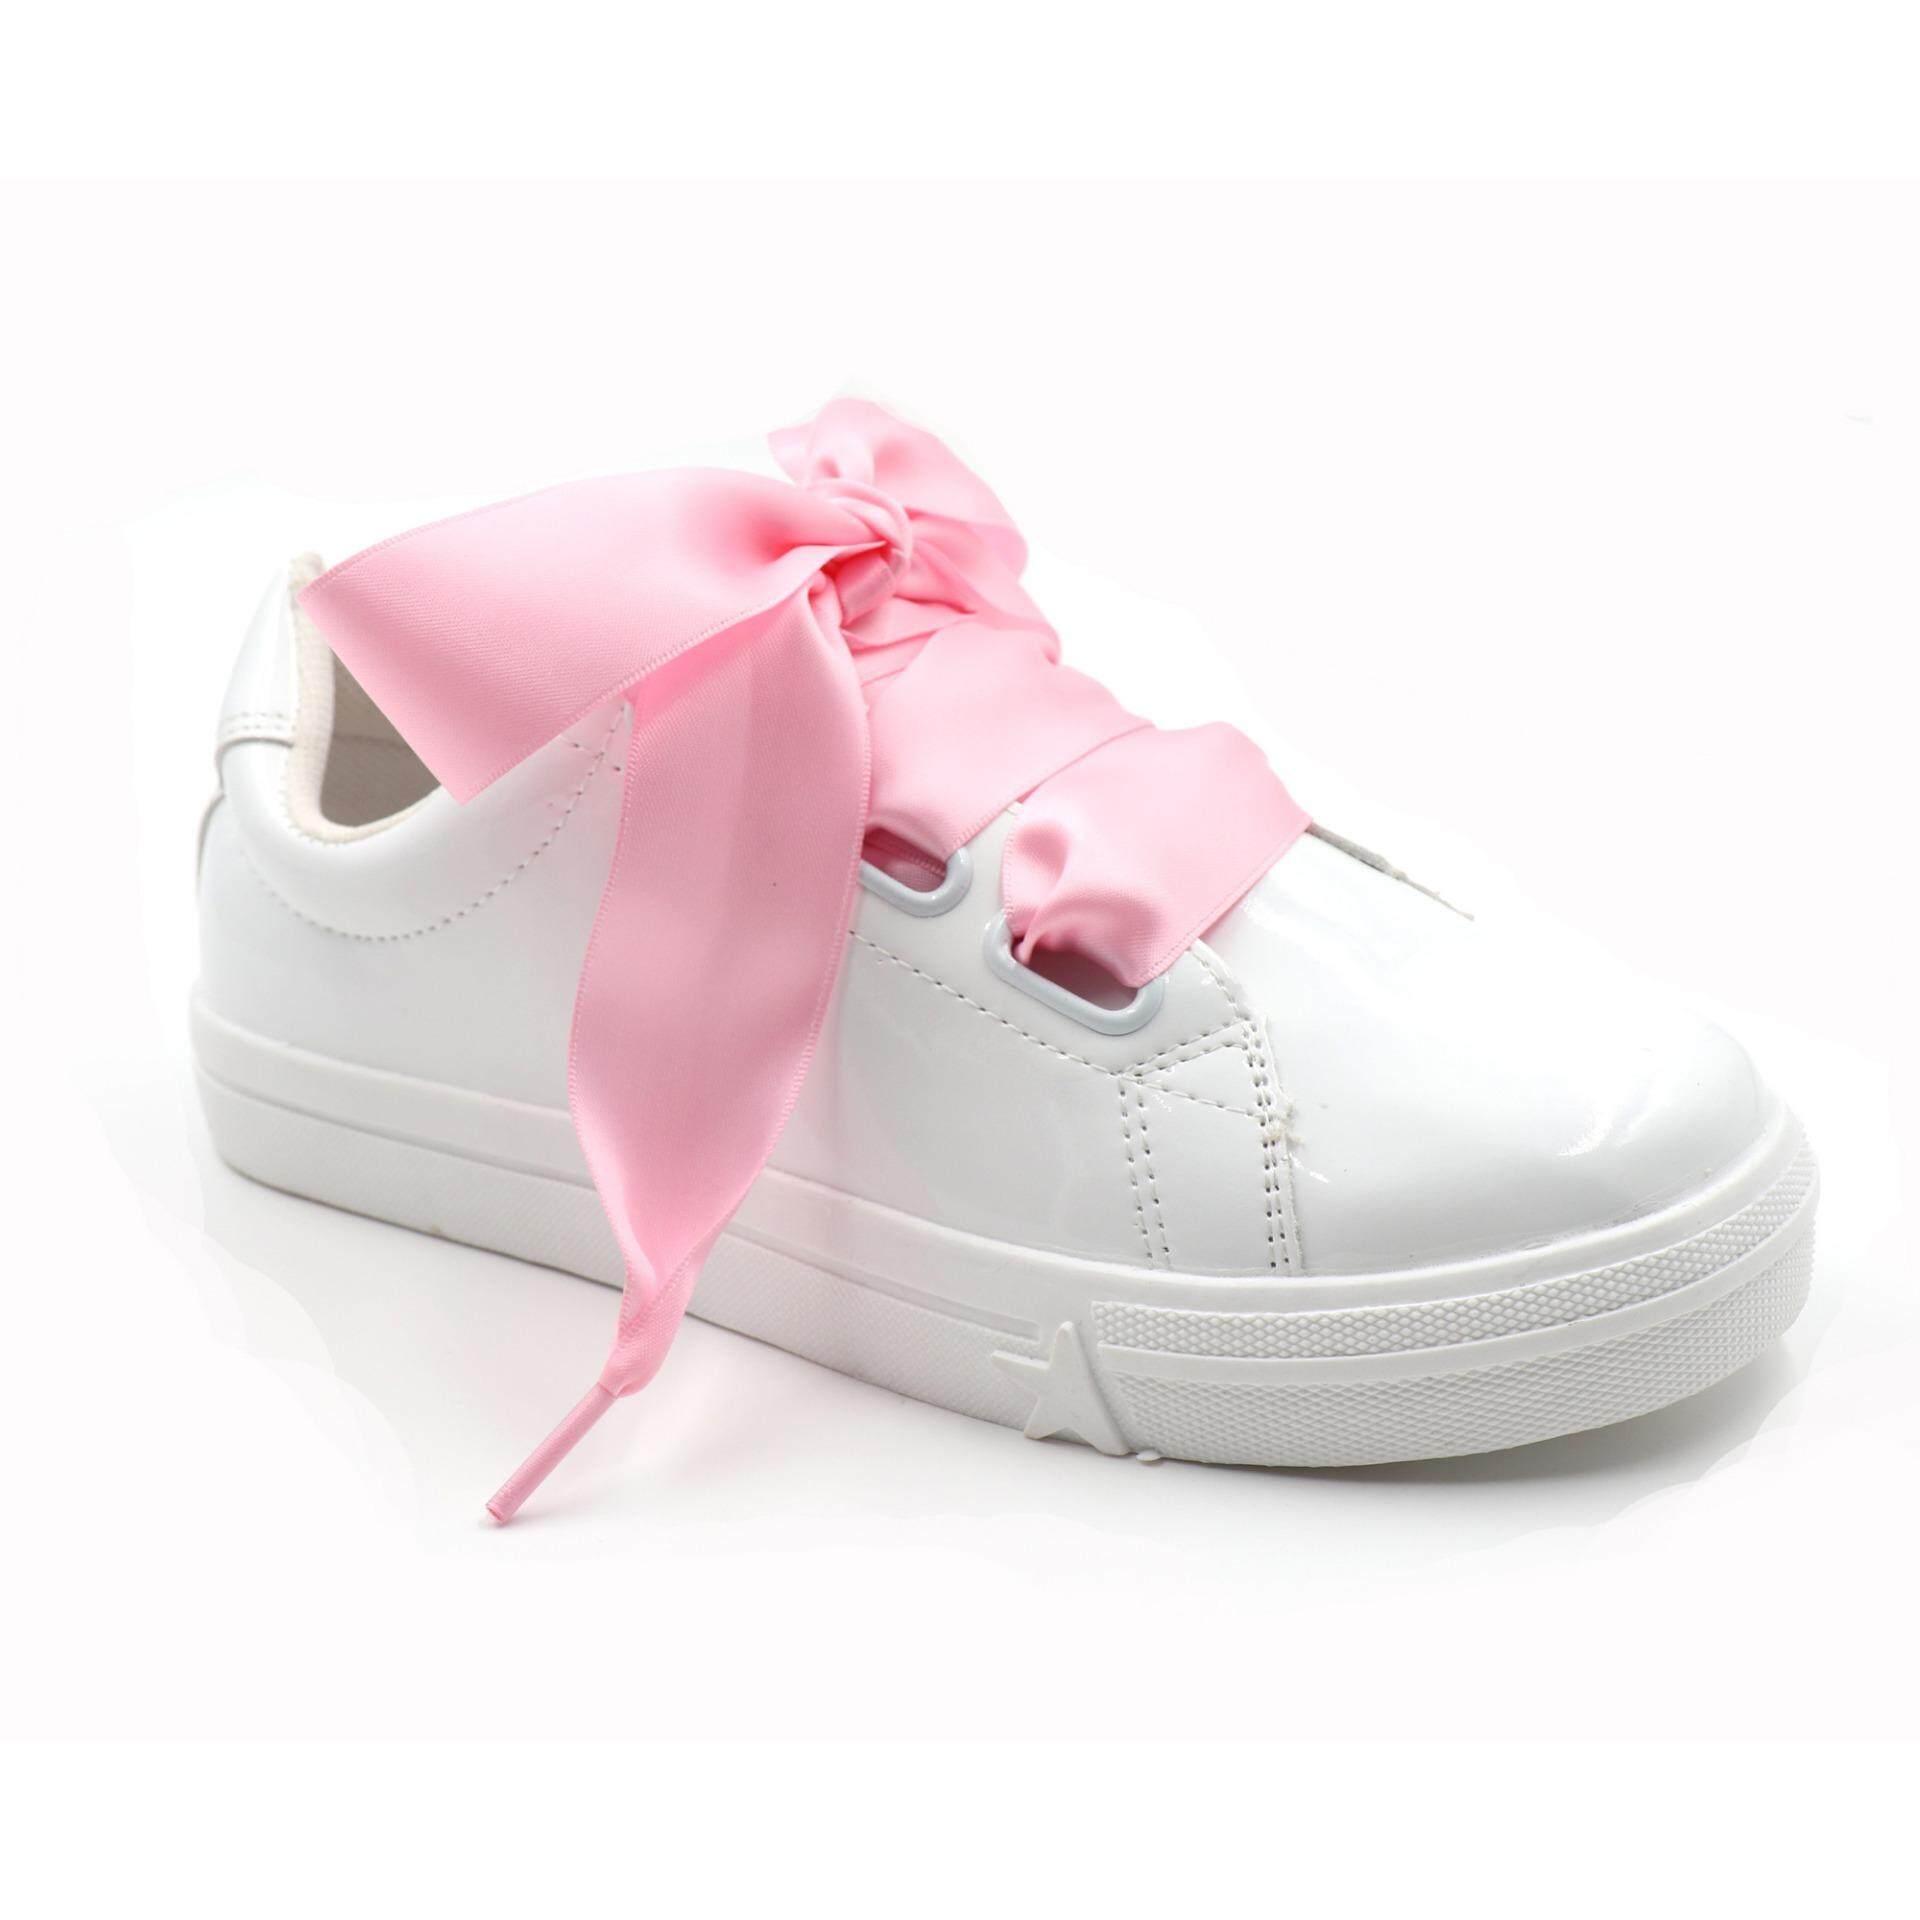 47d1a78785e5a COOL LACE Satin Ribbon Shoelaces Flat Shoe Laces 1 Pair Pack 32mm Wide 3  Different Lengths - intl